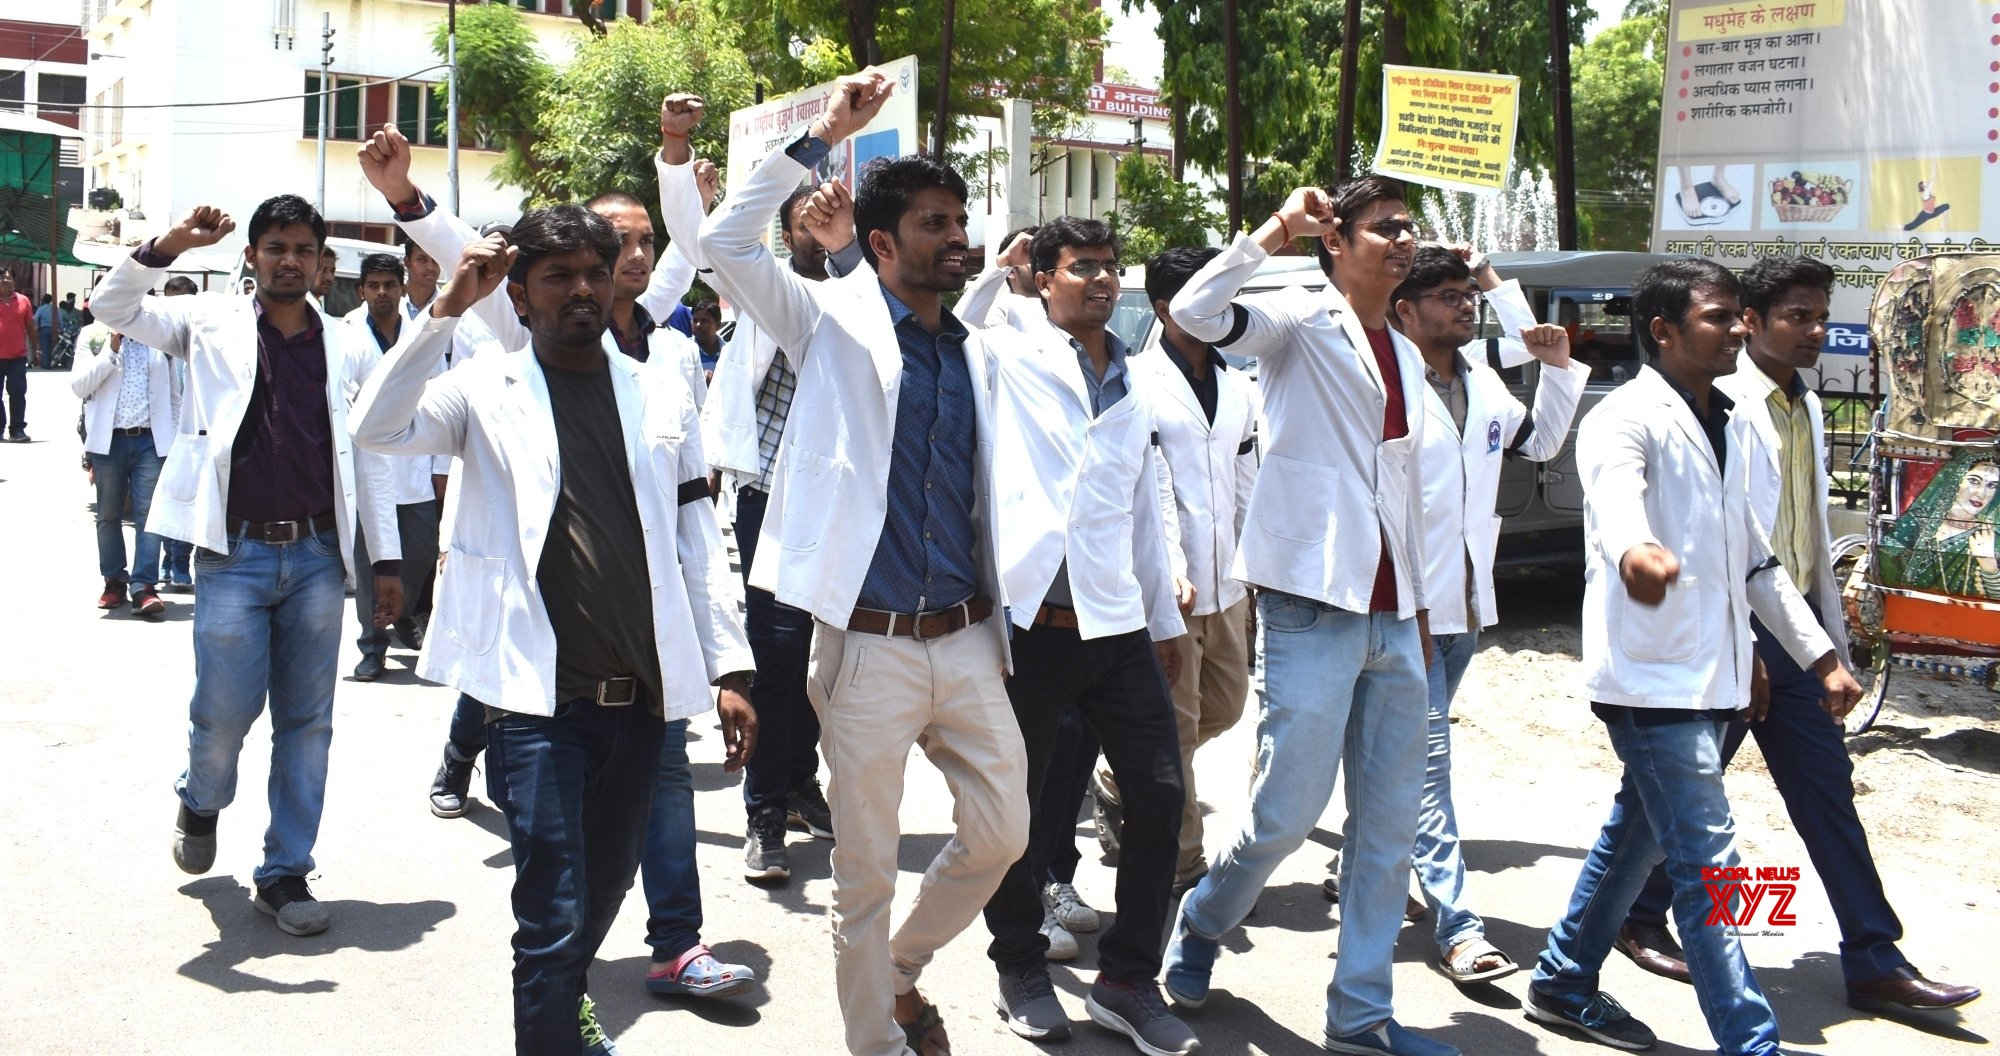 Prayagraj: UP medicos protest against attack on doctors #Gallery